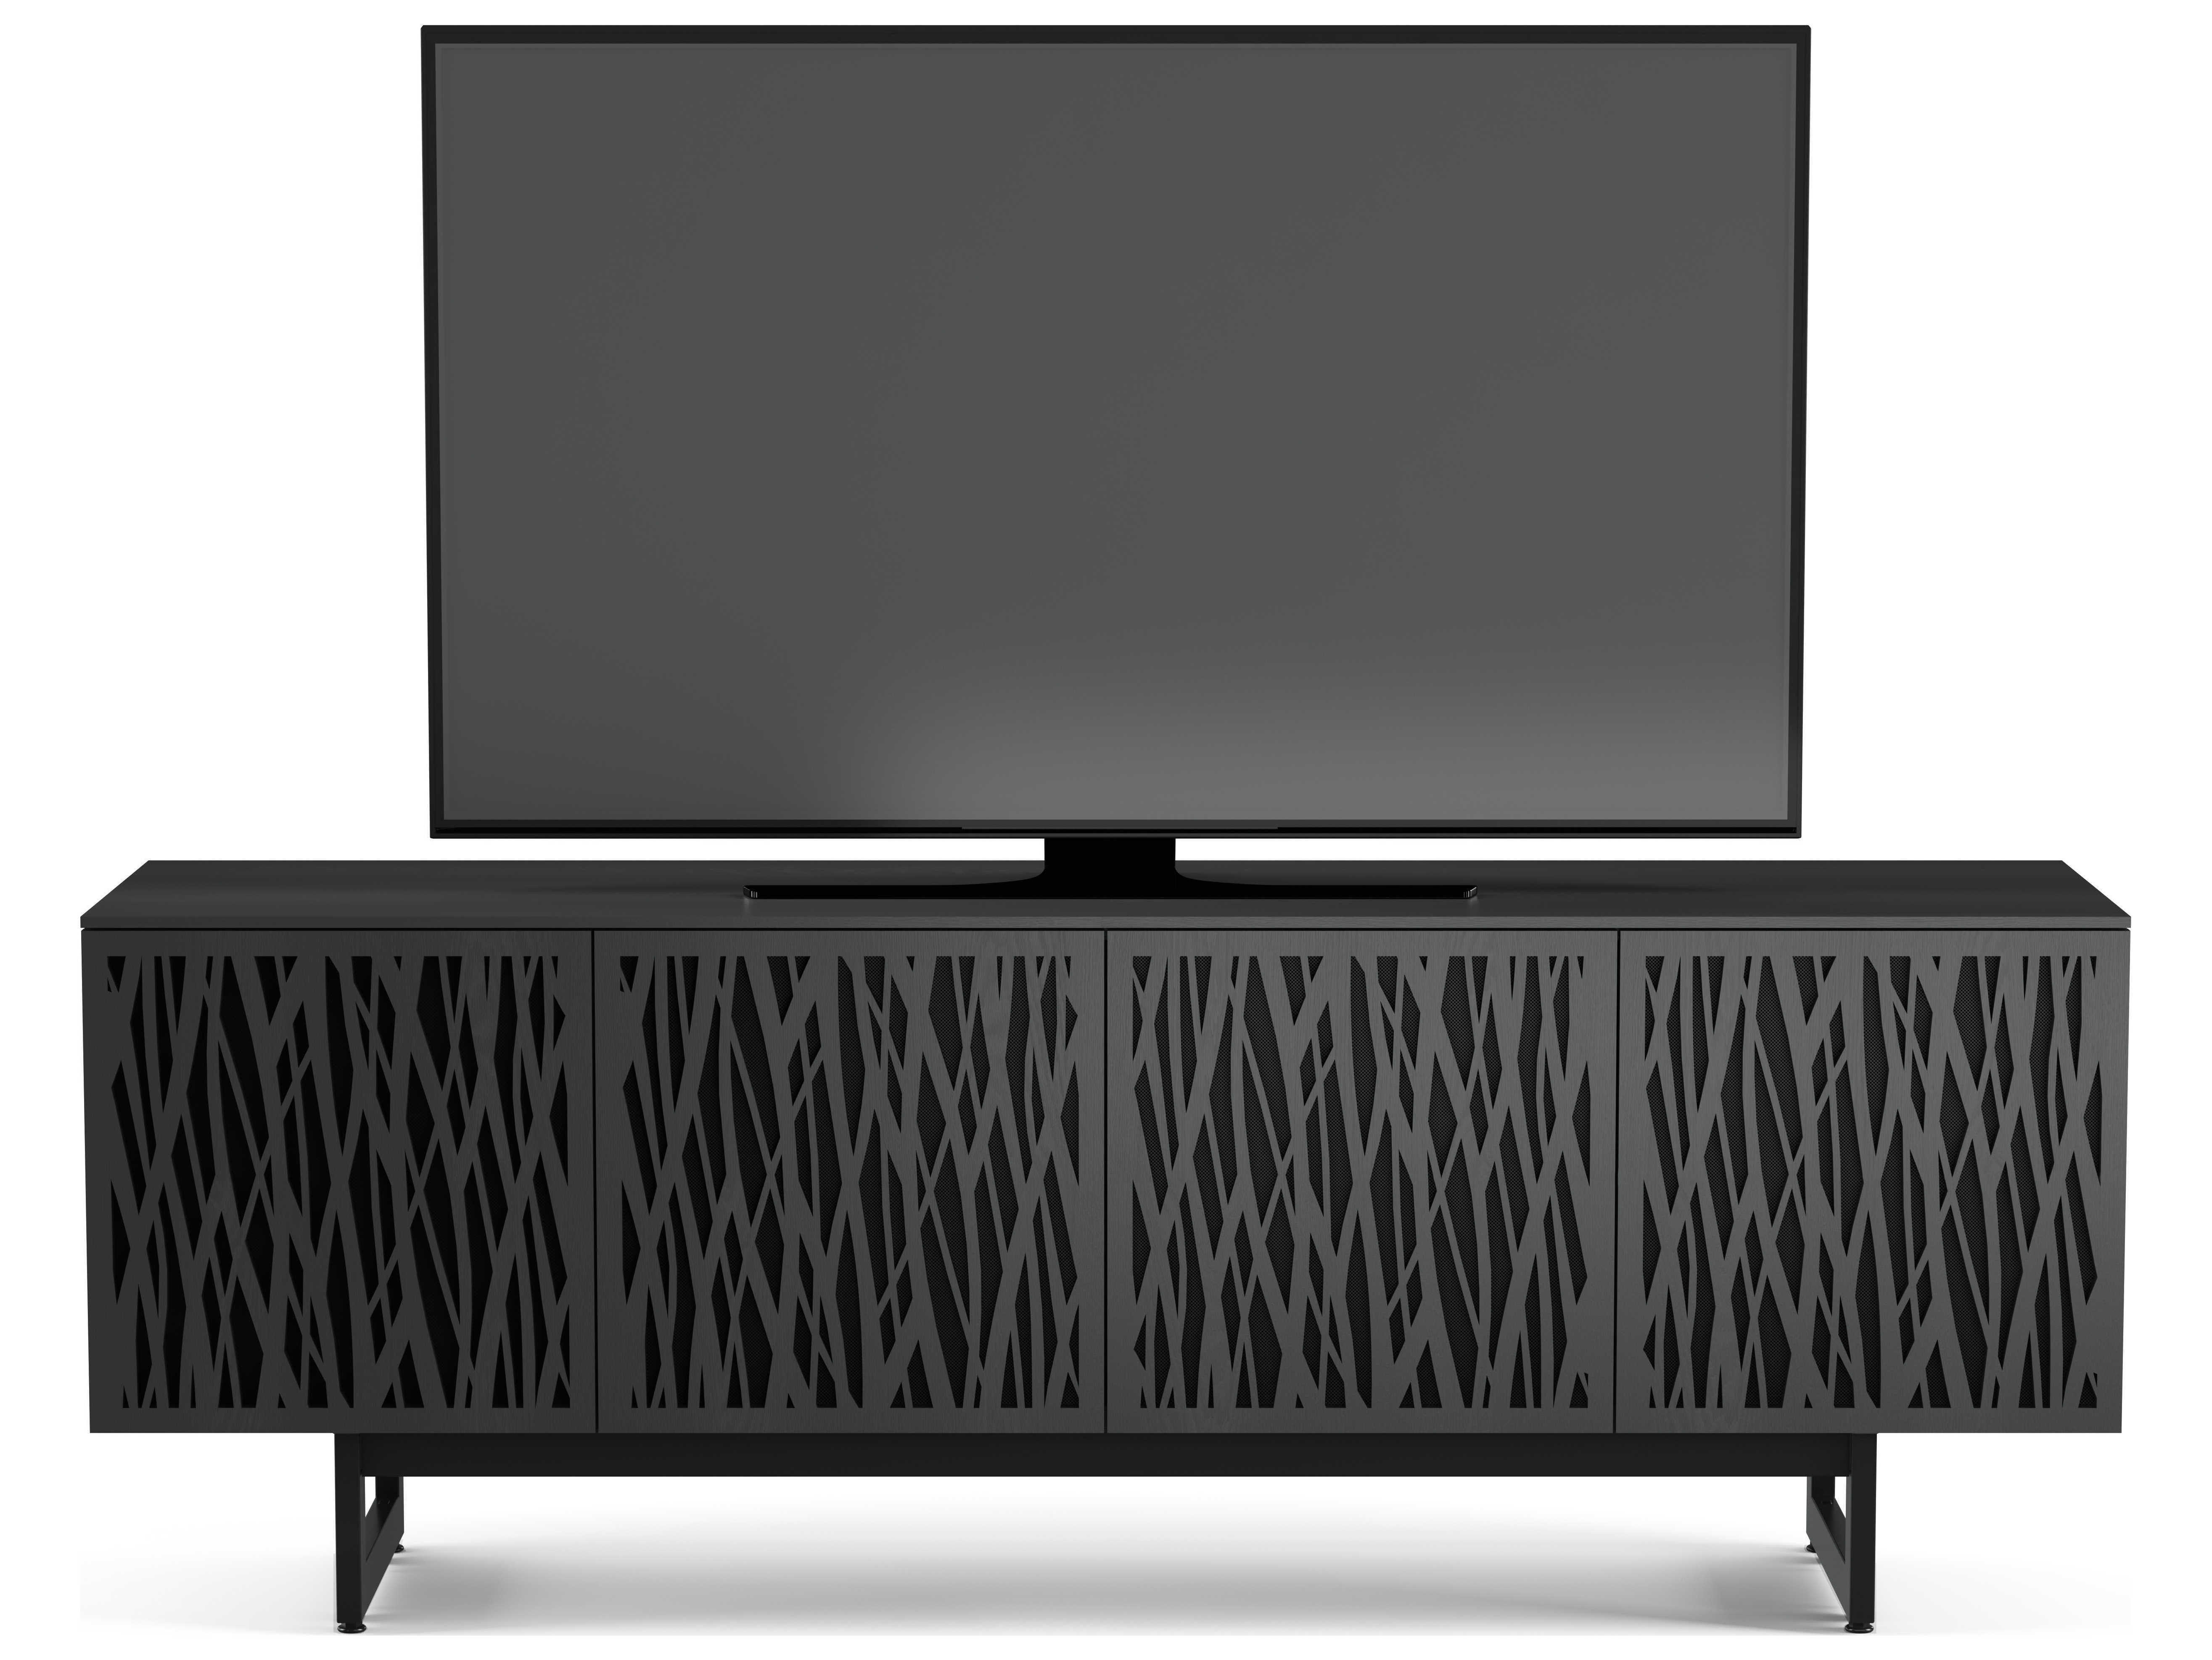 visualization com cg cgrendering render cupboard studio bdi b project furniture